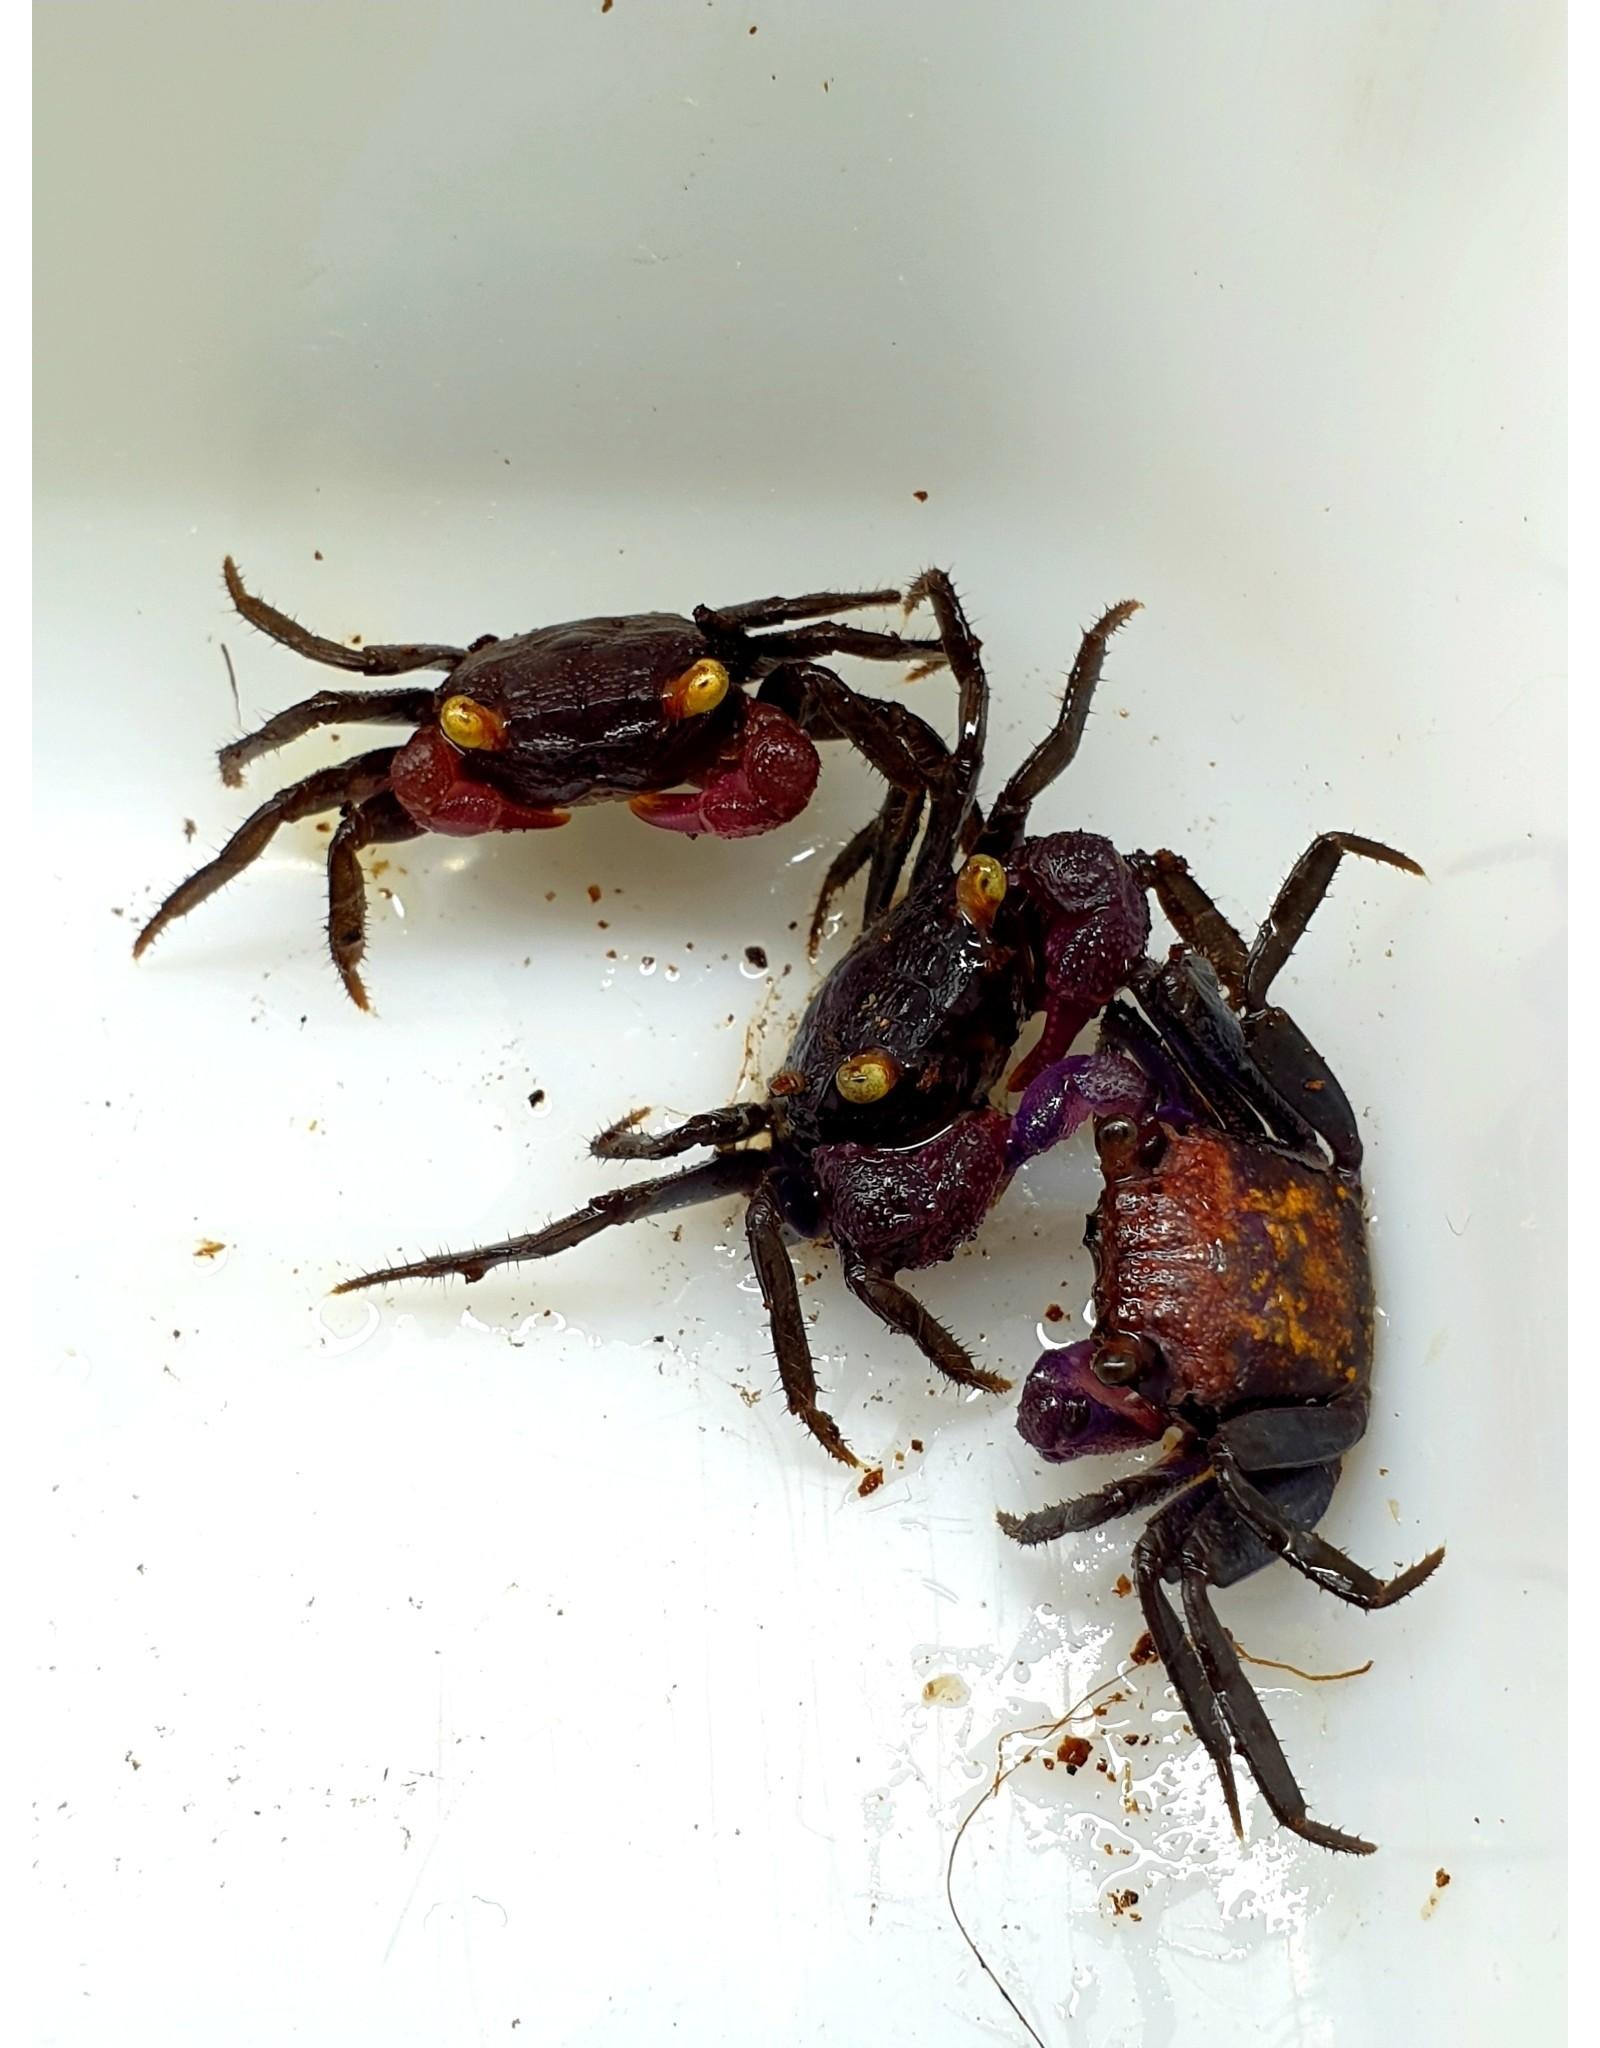 Bubba's Crabs Crabe - Bogorensis Ultra violet